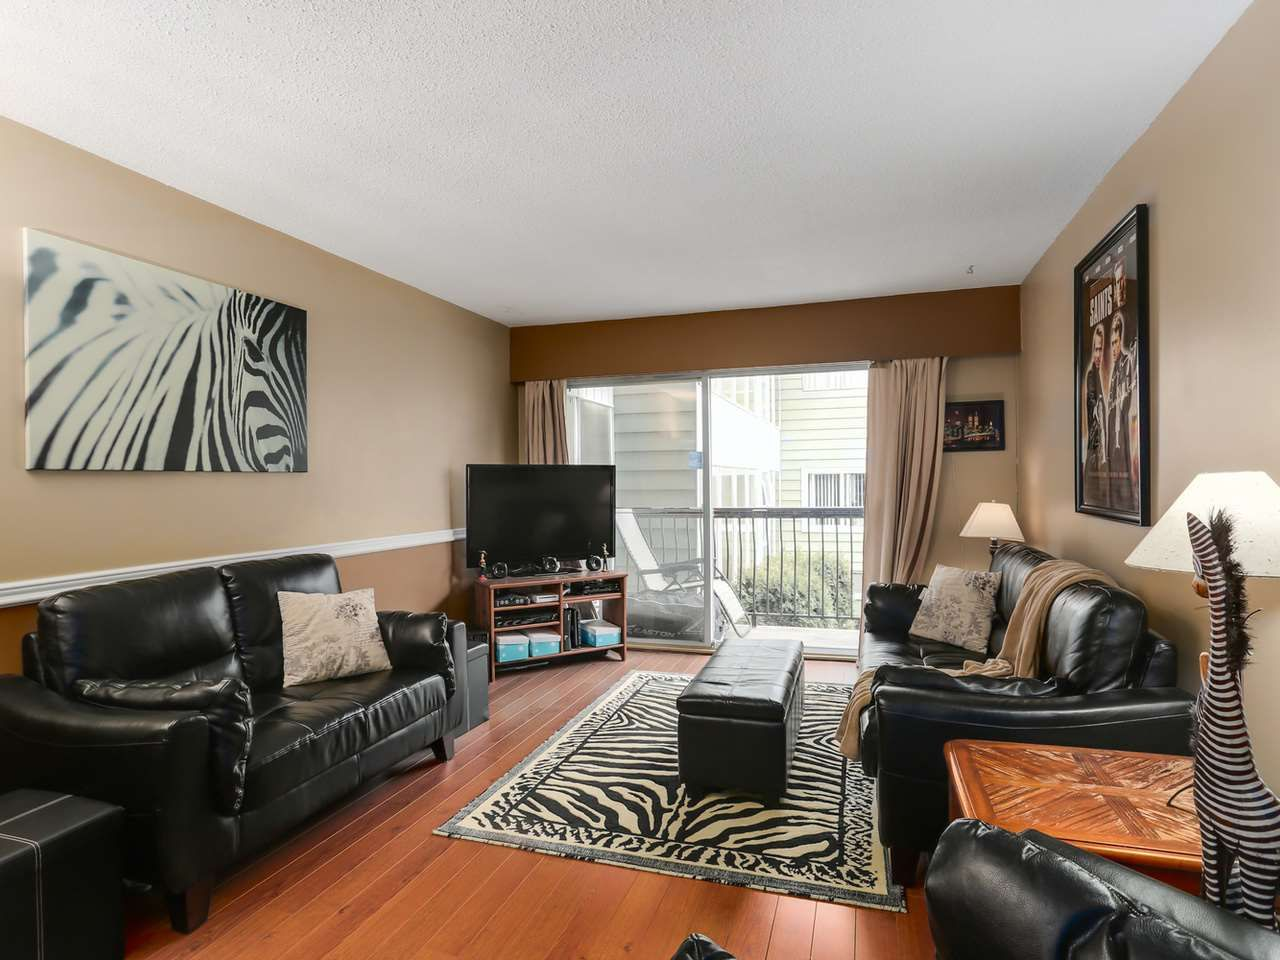 "Photo 5: Photos: 278C 8635 120 Street in Delta: Annieville Condo for sale in ""Delta Cedars"" (N. Delta)  : MLS®# R2037207"